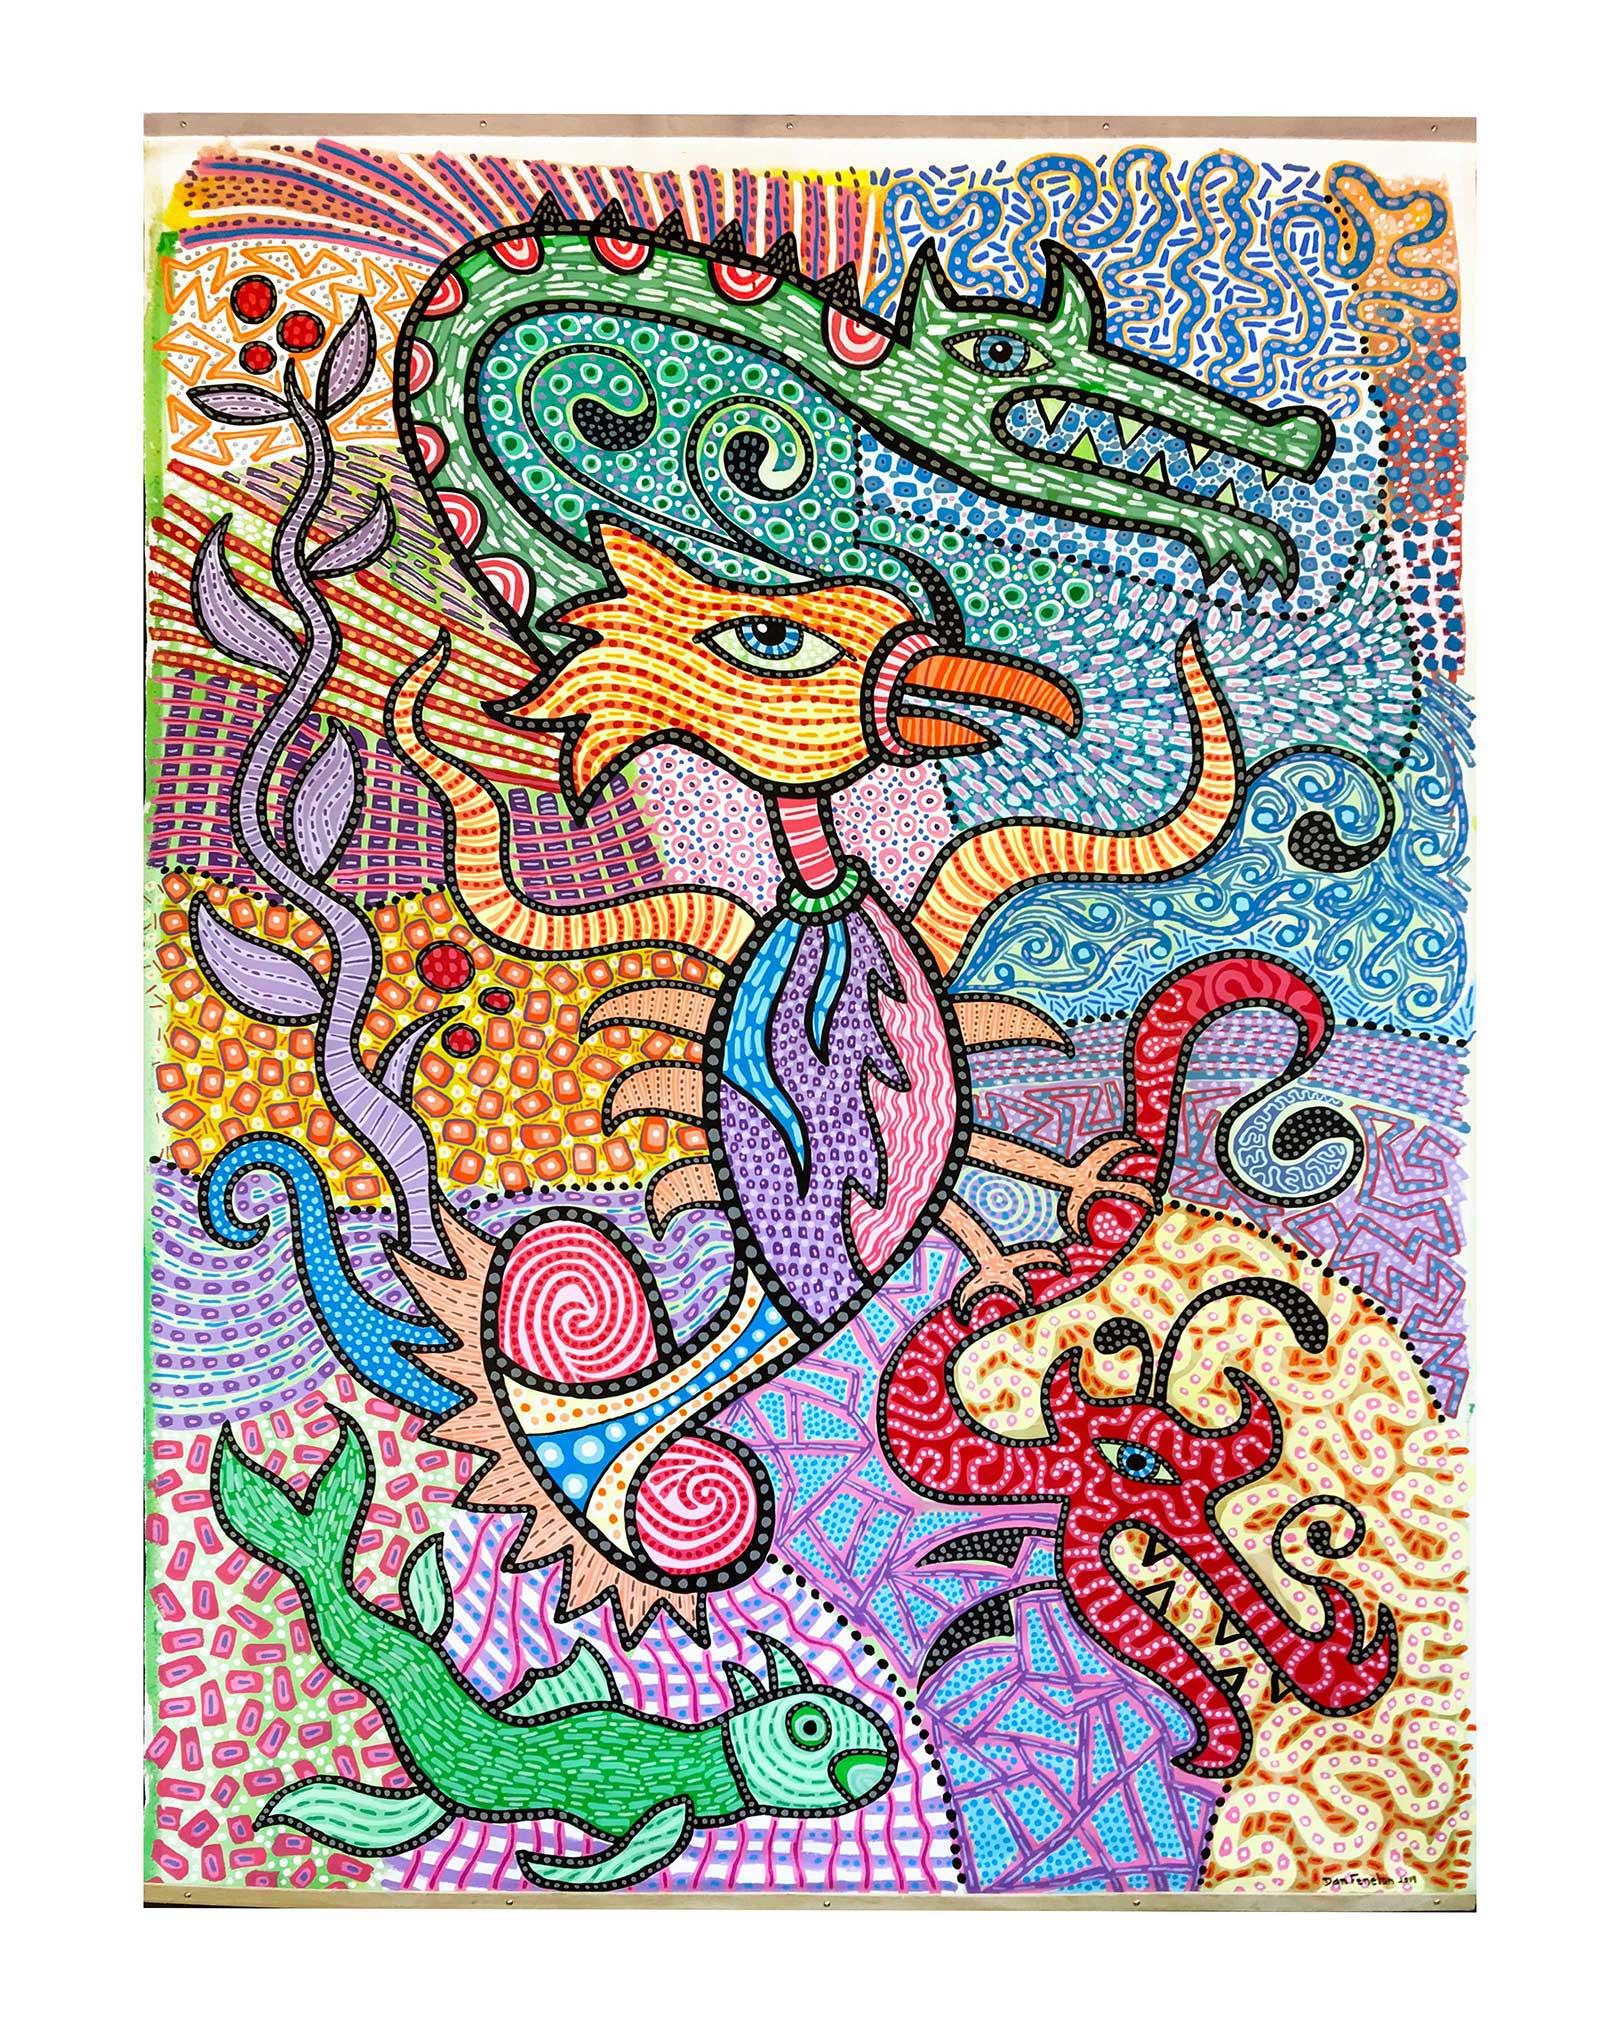 Wrath of the Raptor